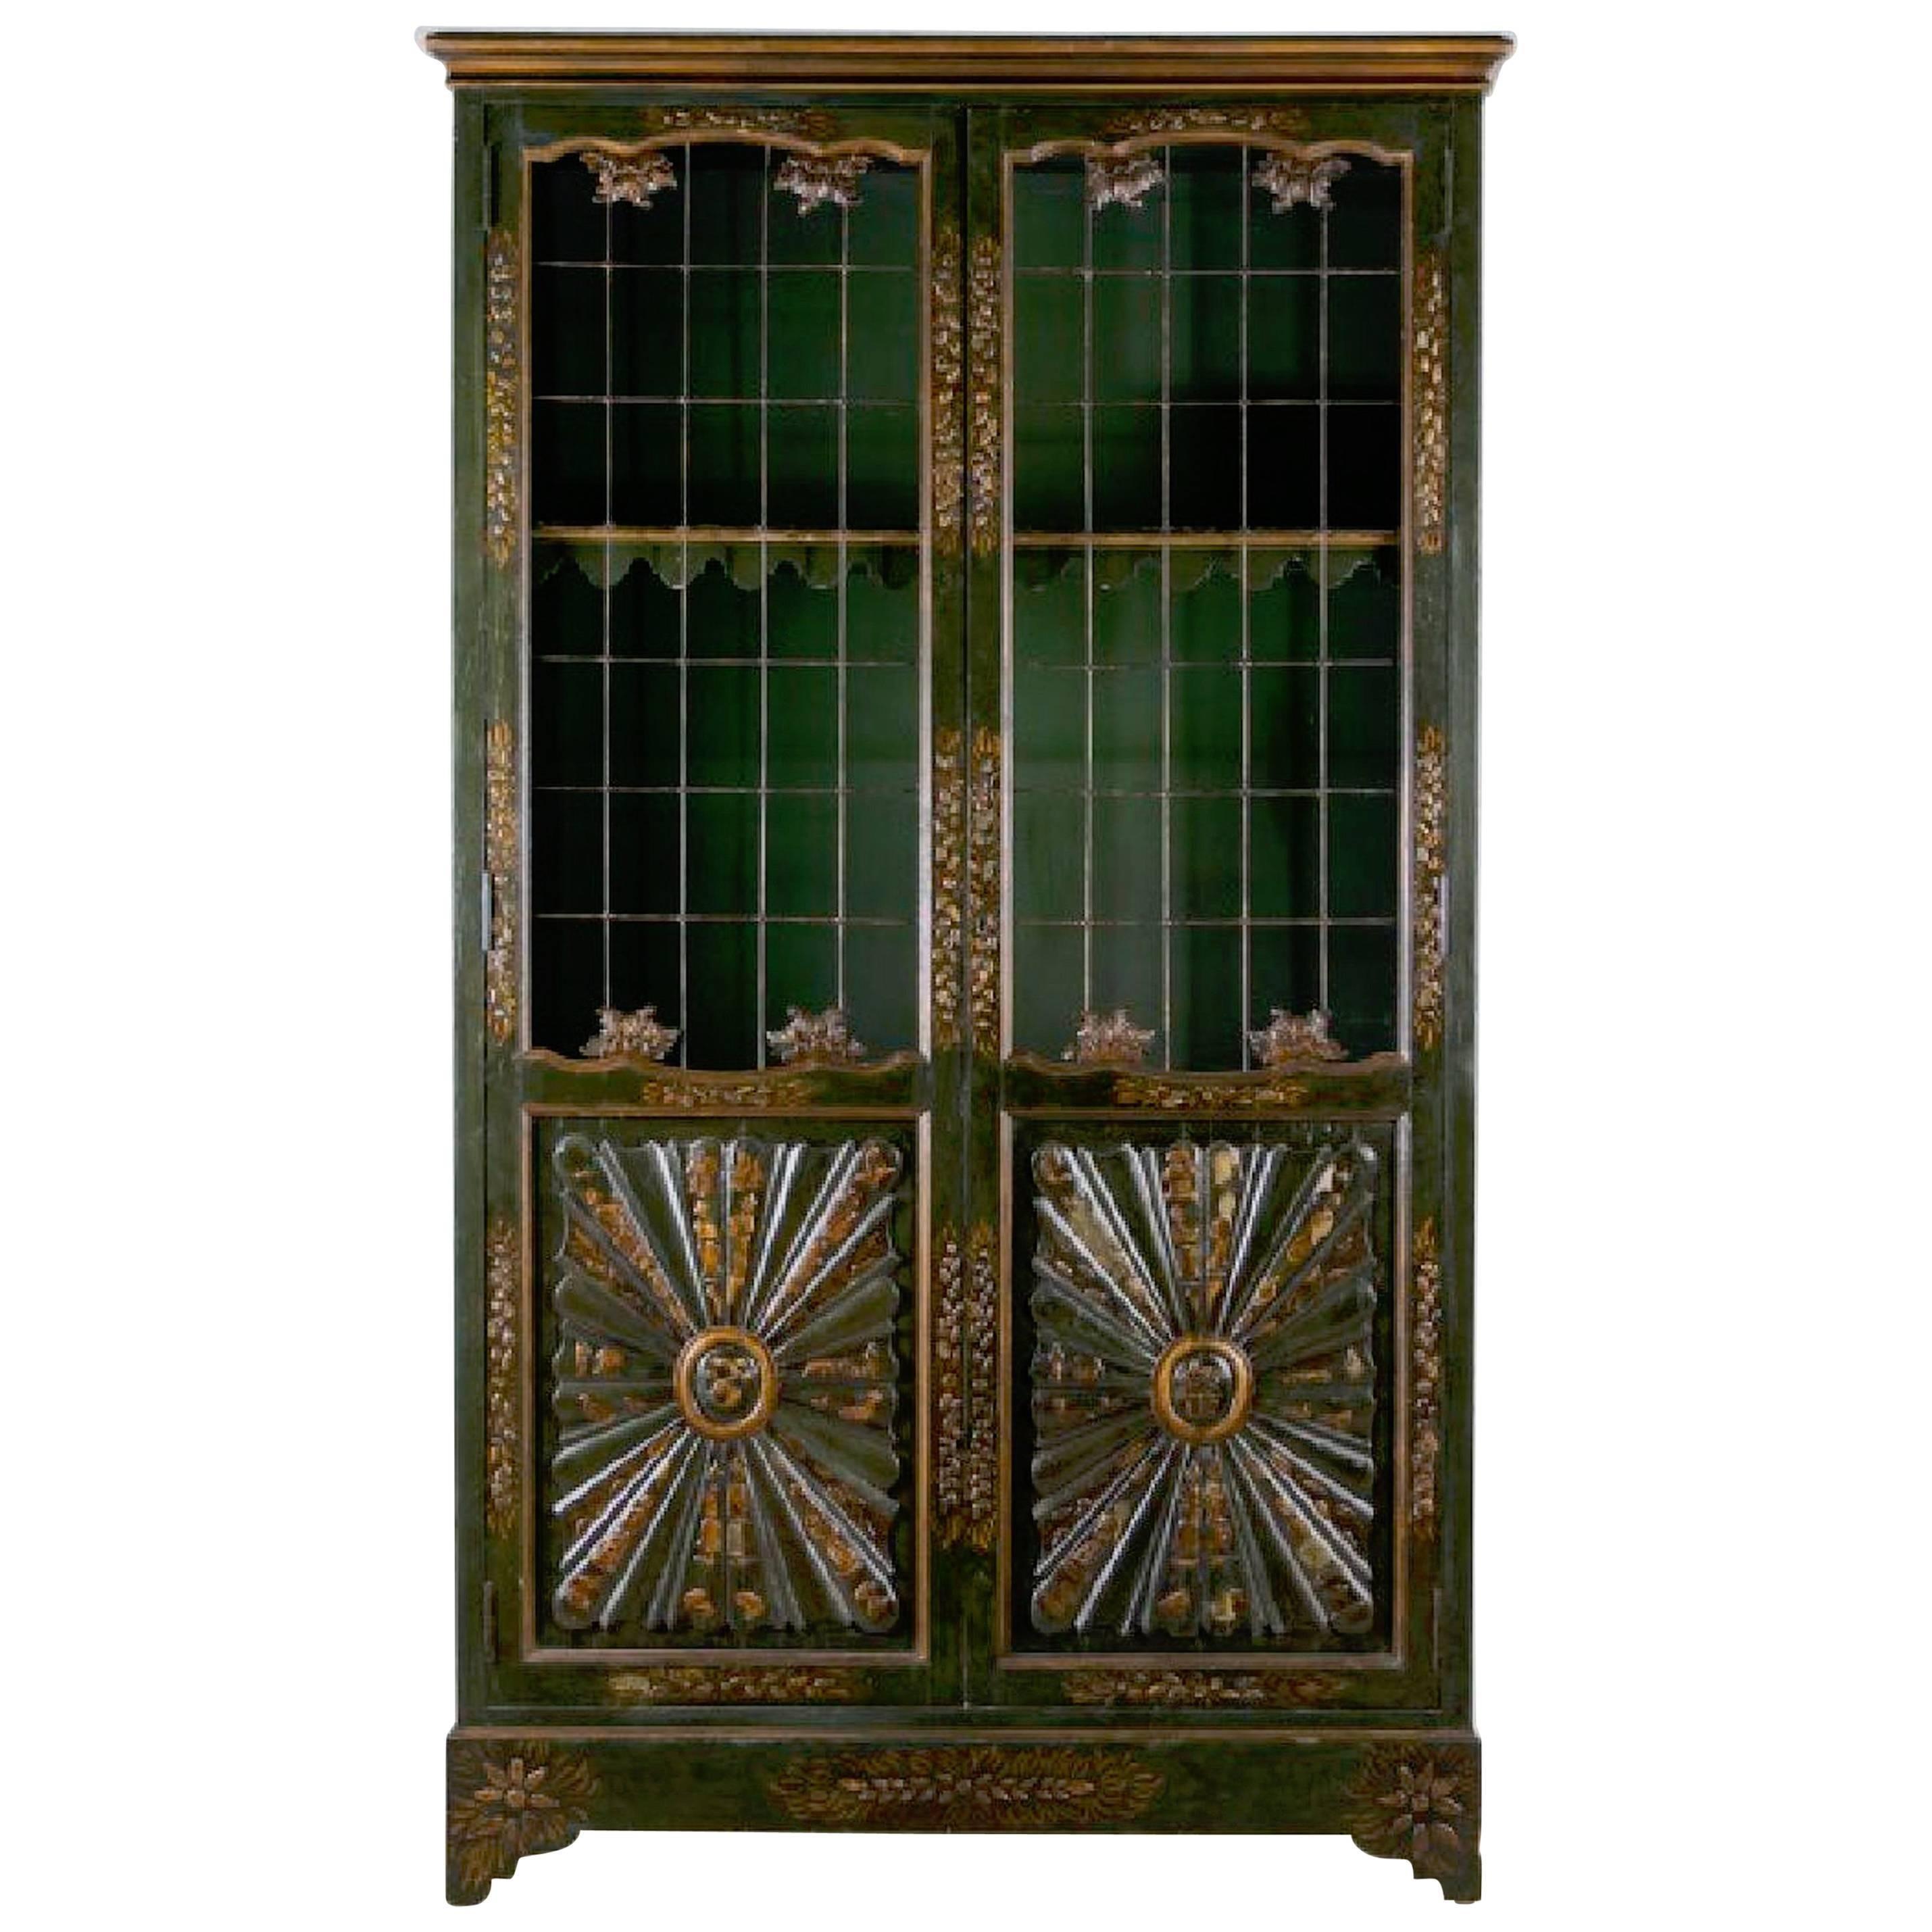 Parish-Hadley Chinoiserie Lacquered Bookcase